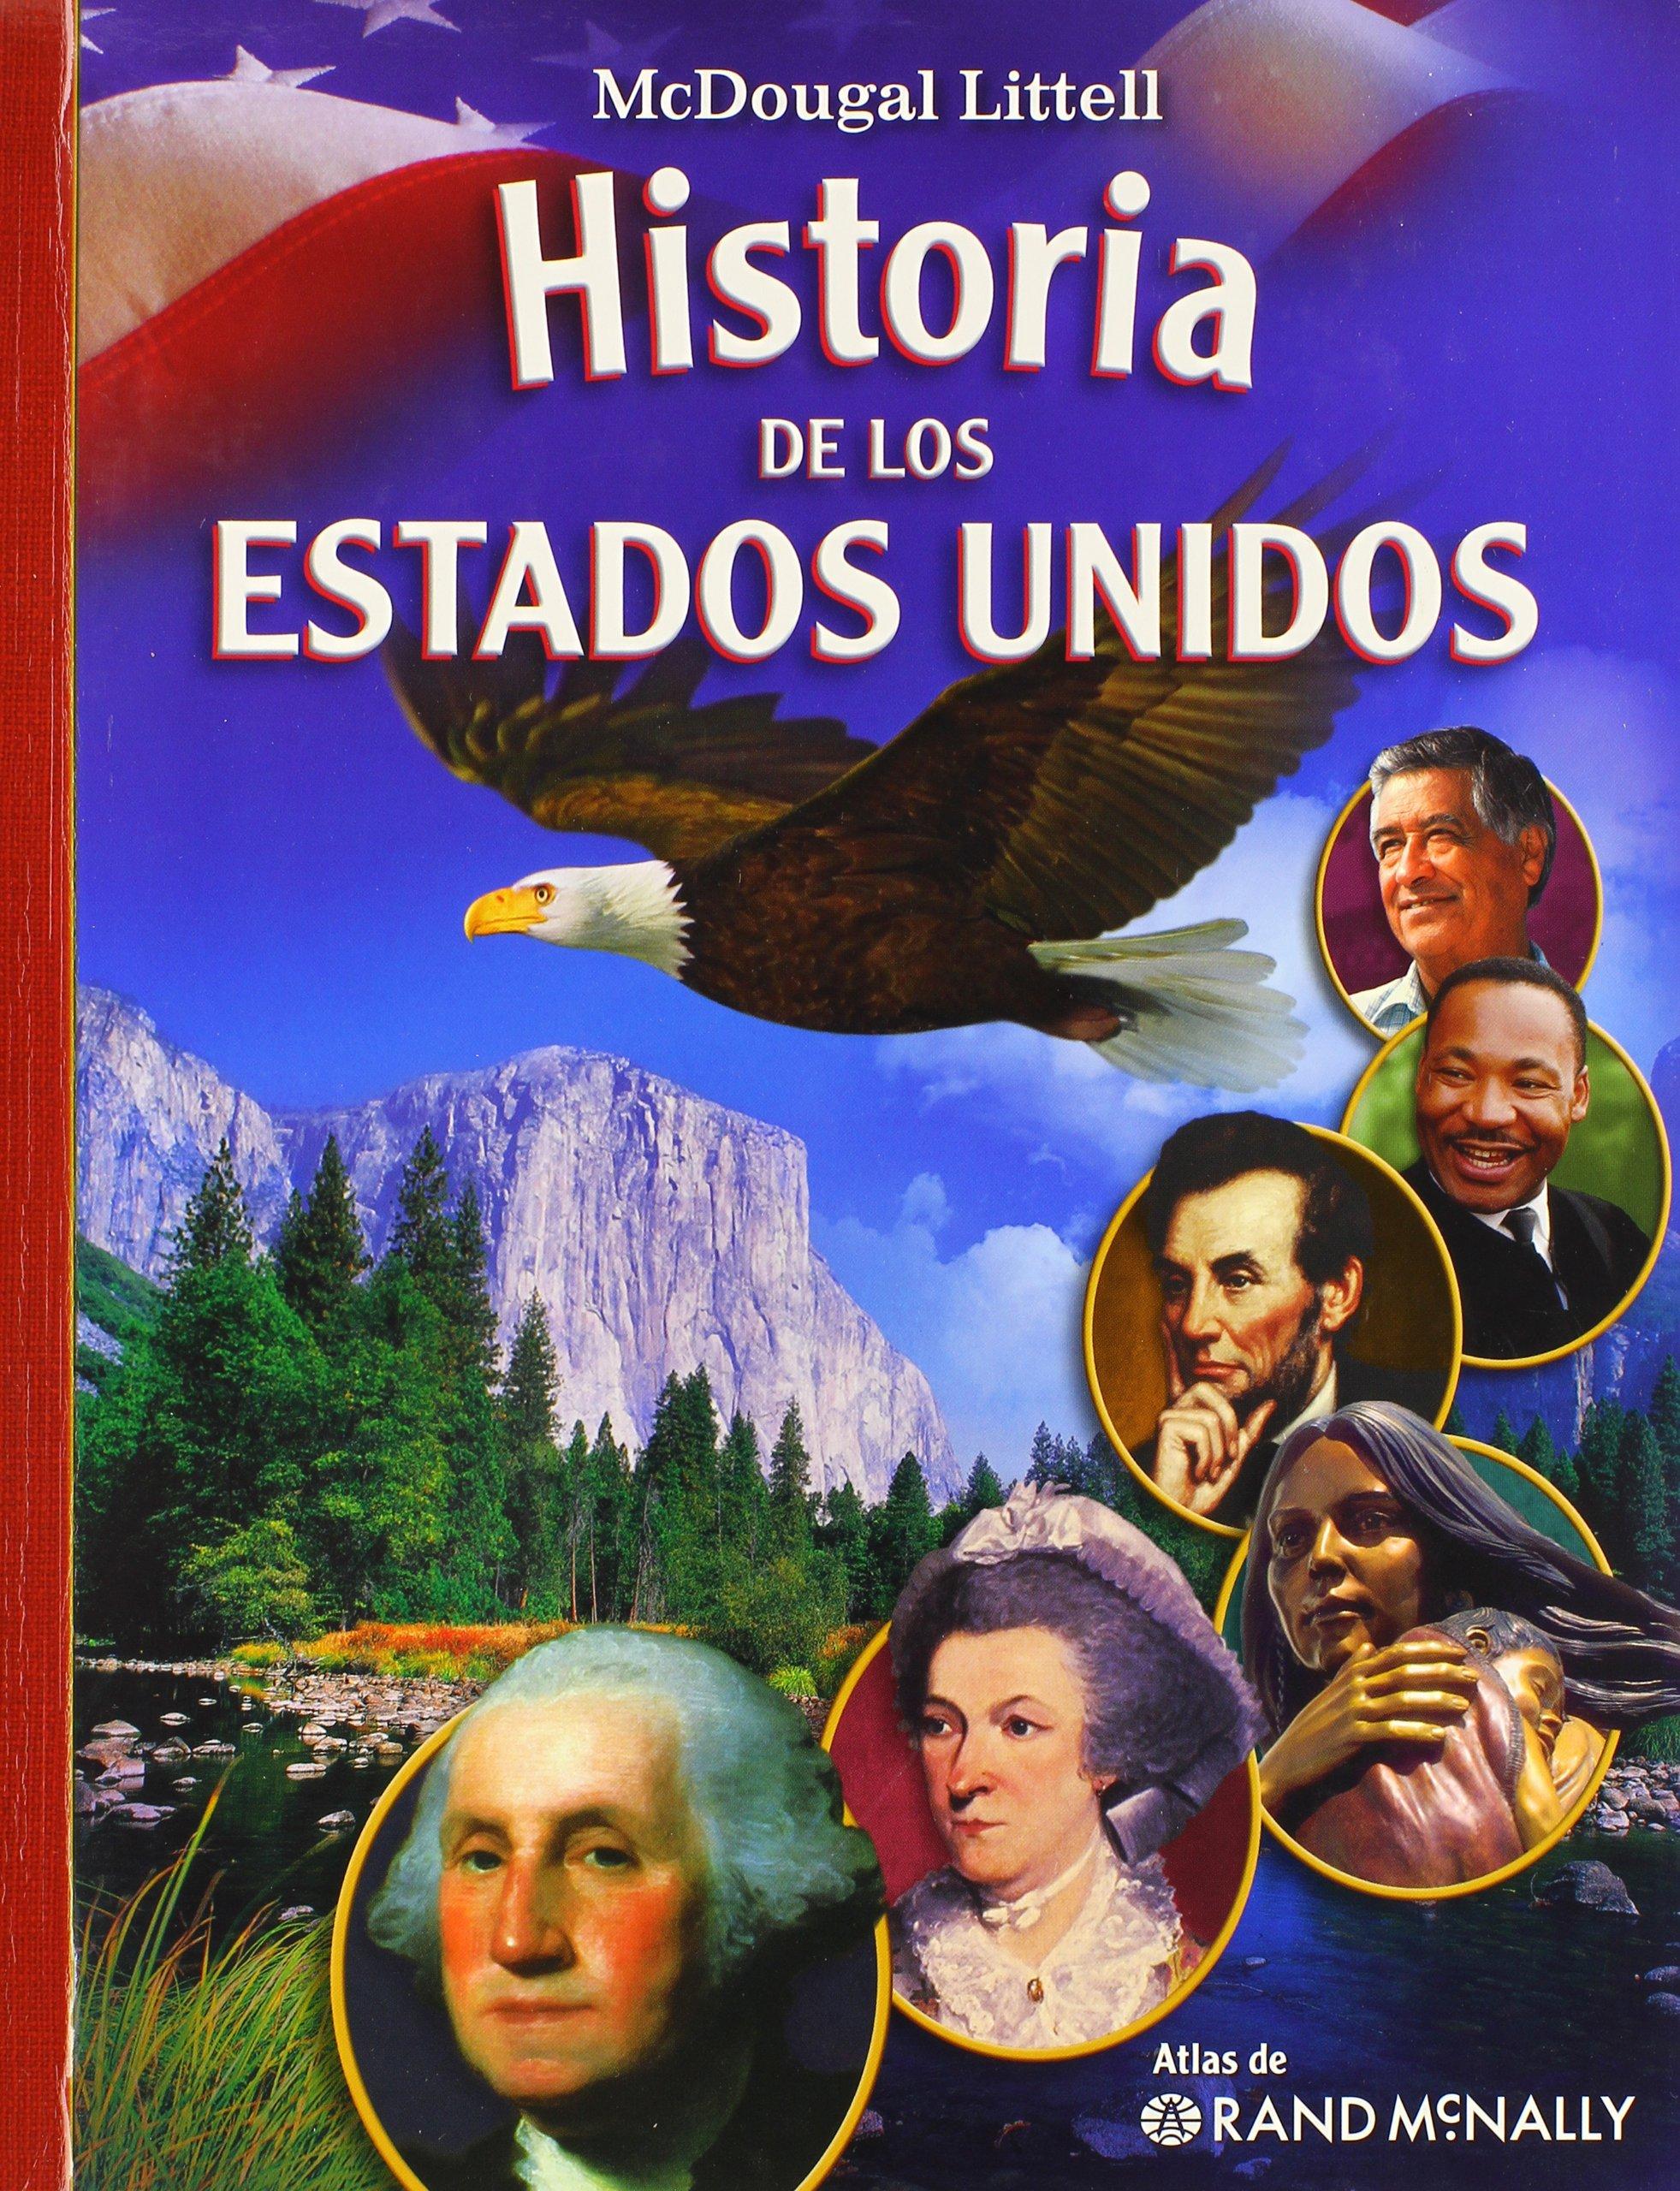 McDougal Littell Middle School American History: Spanish Student Edition 2008 (Spanish Edition) ebook